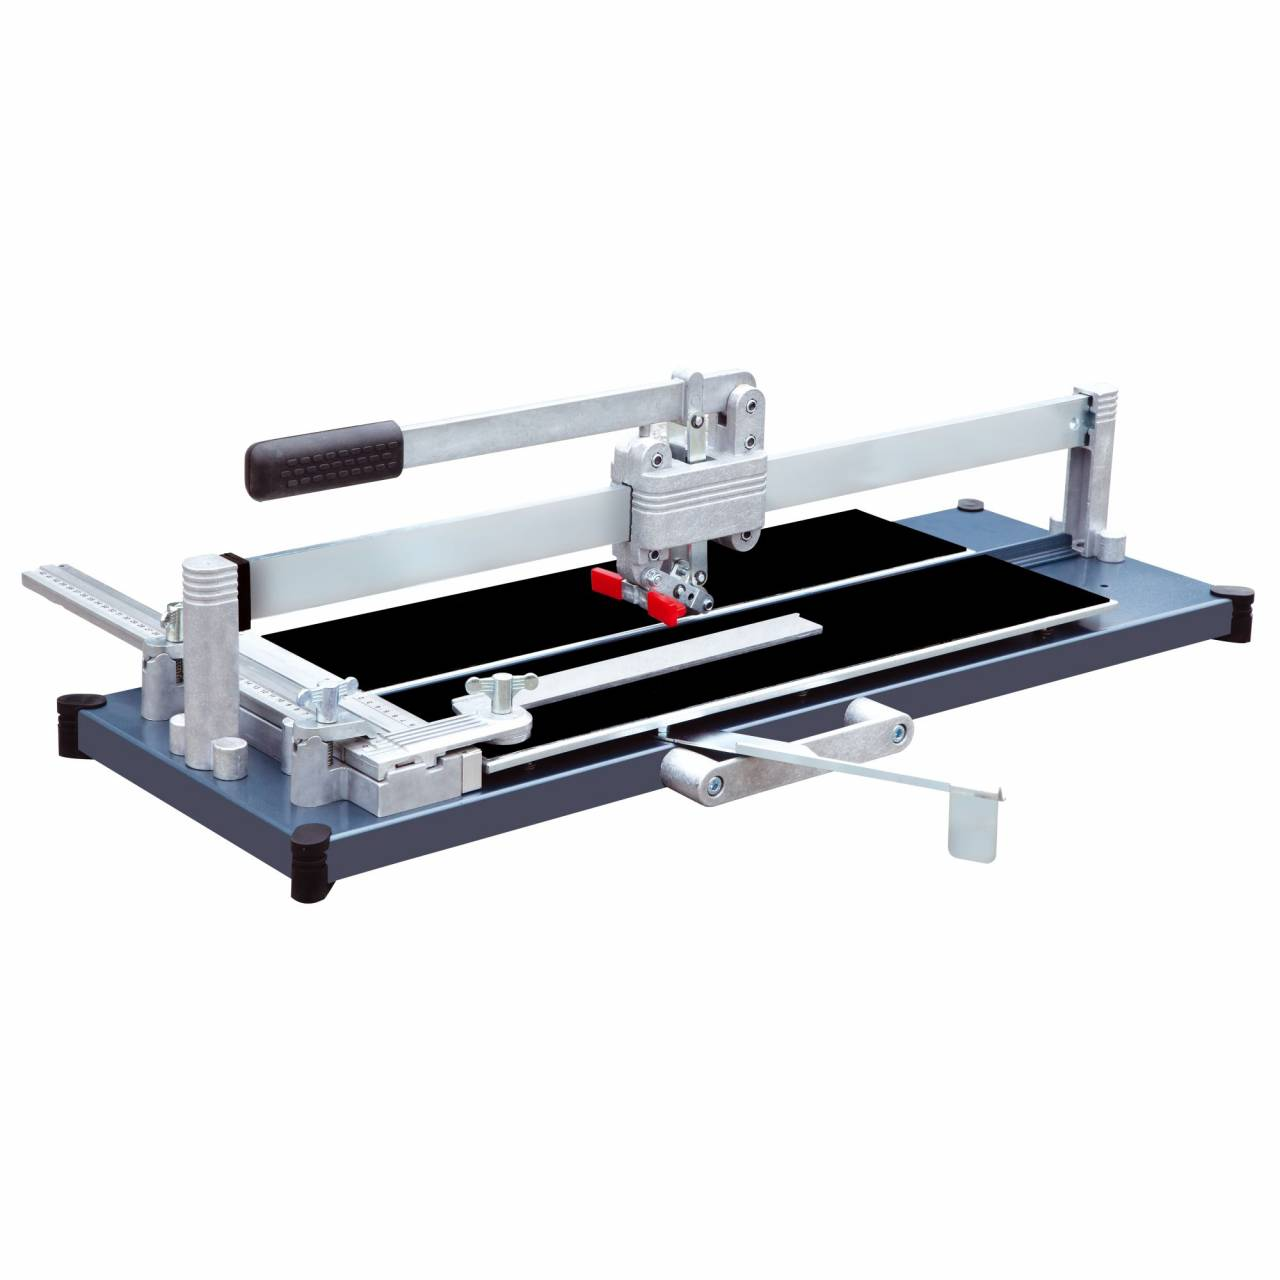 Fliesenschneidmaschine 1250 mm, Kaufmann® Topline-Pro